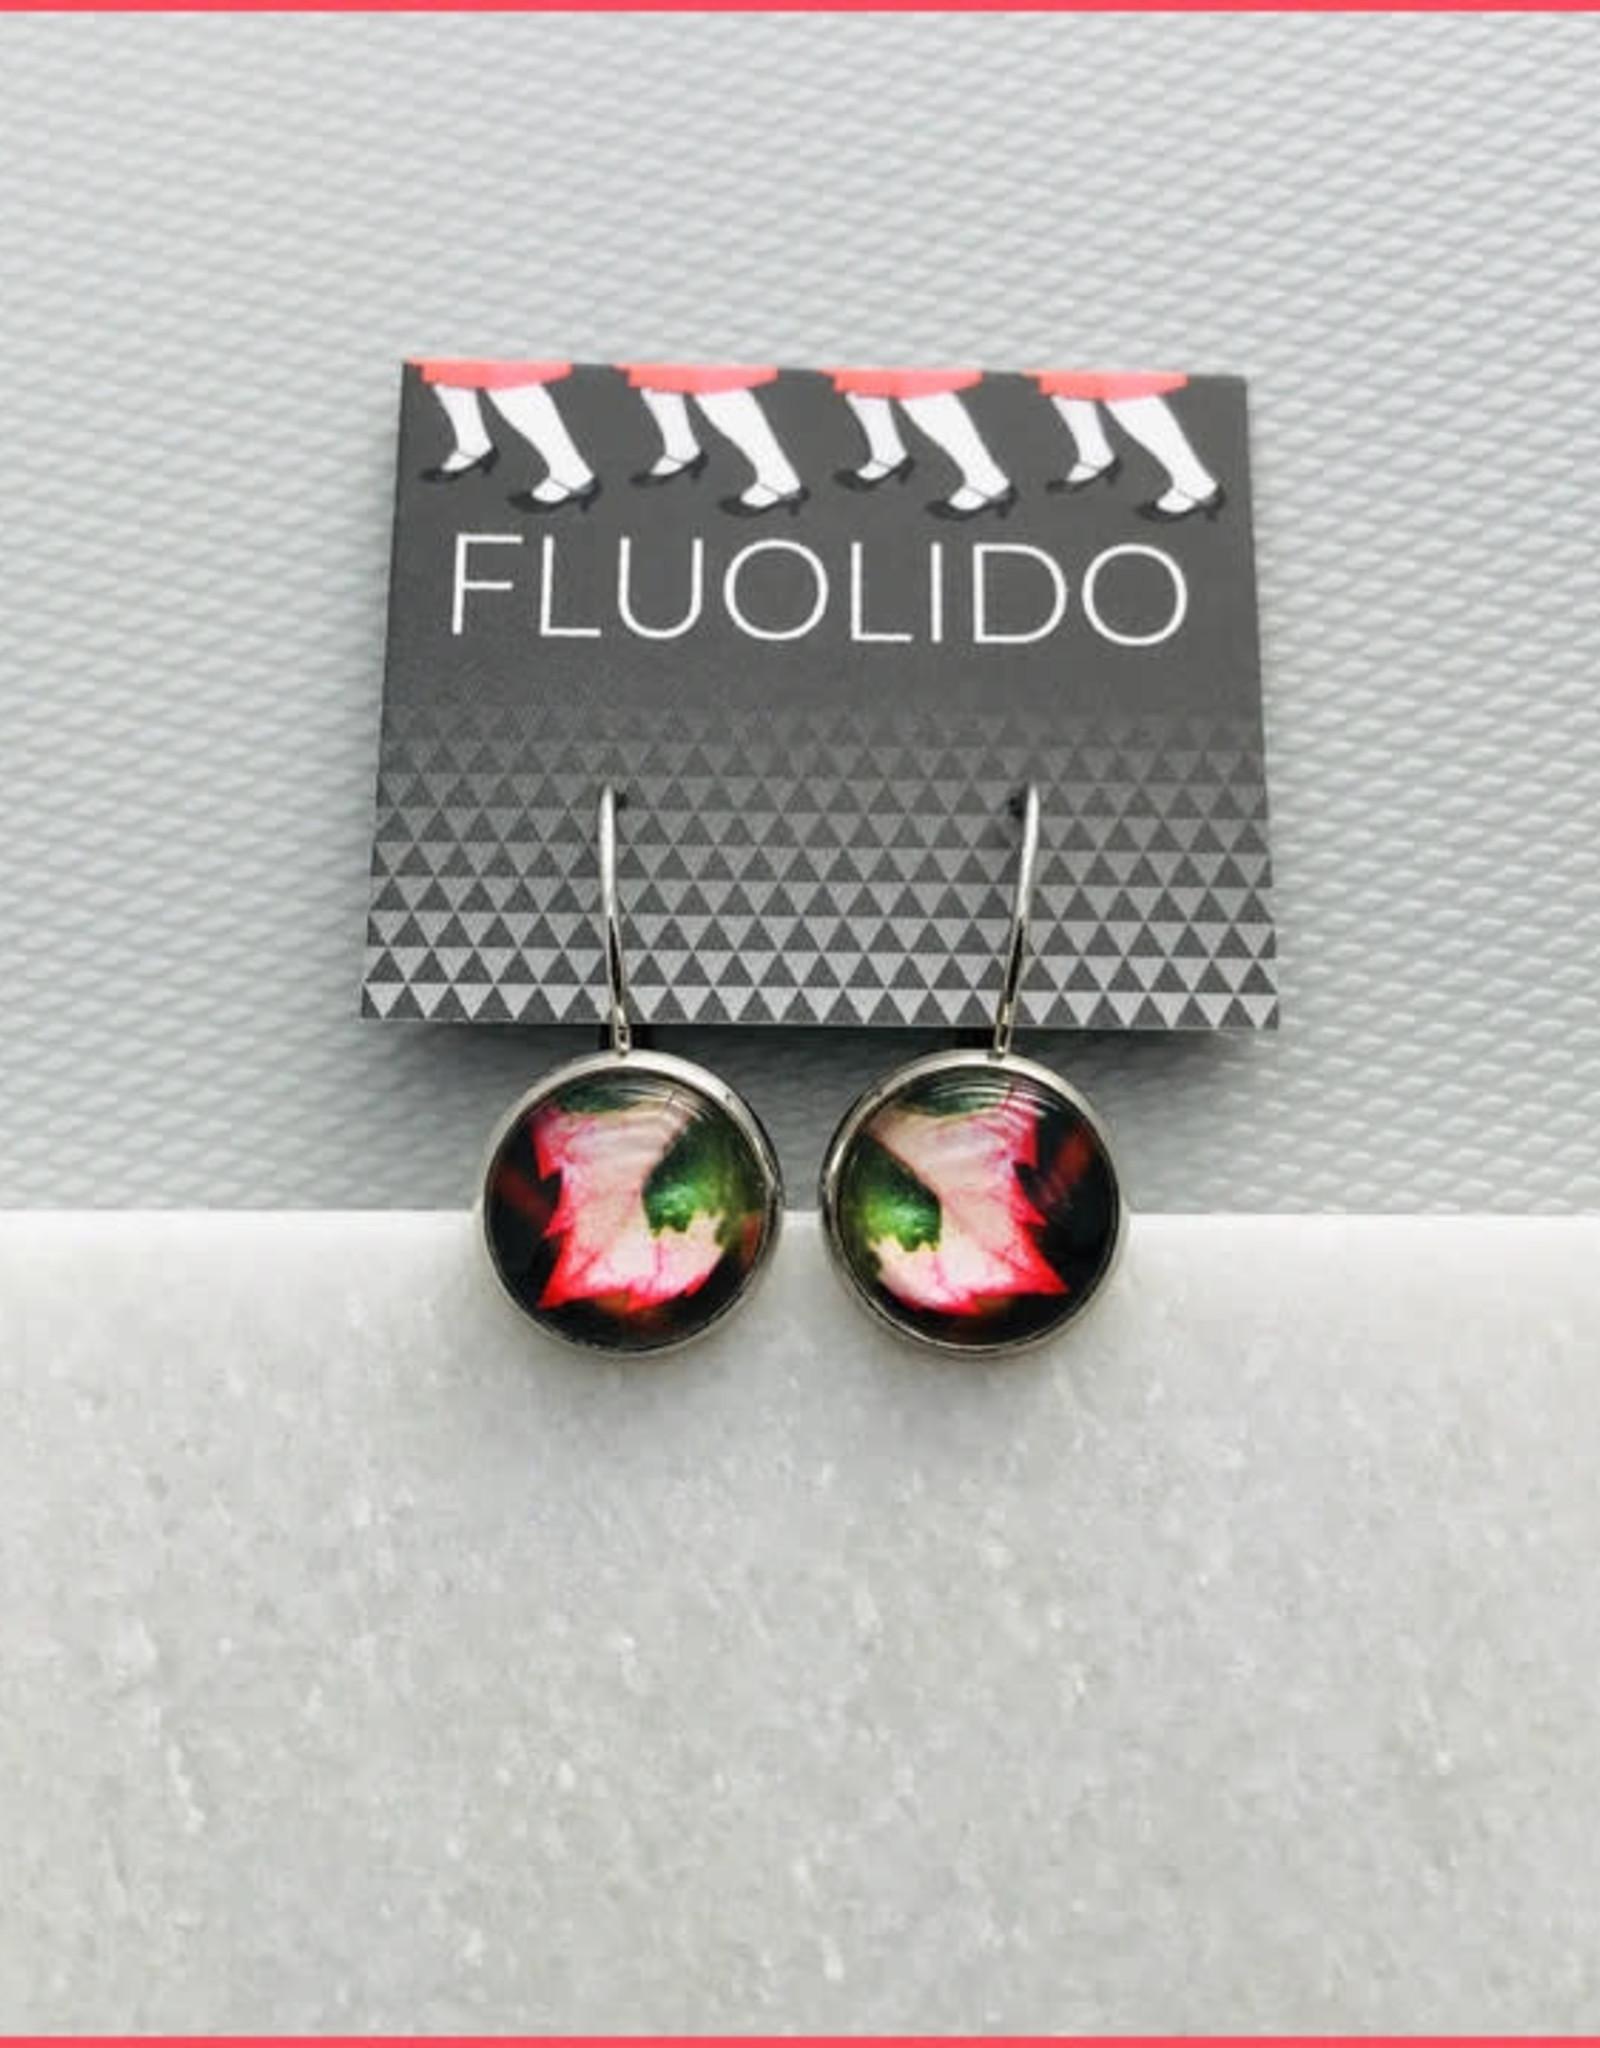 Fluolido Boucles d'oreilles Micro Fluolido Fluo